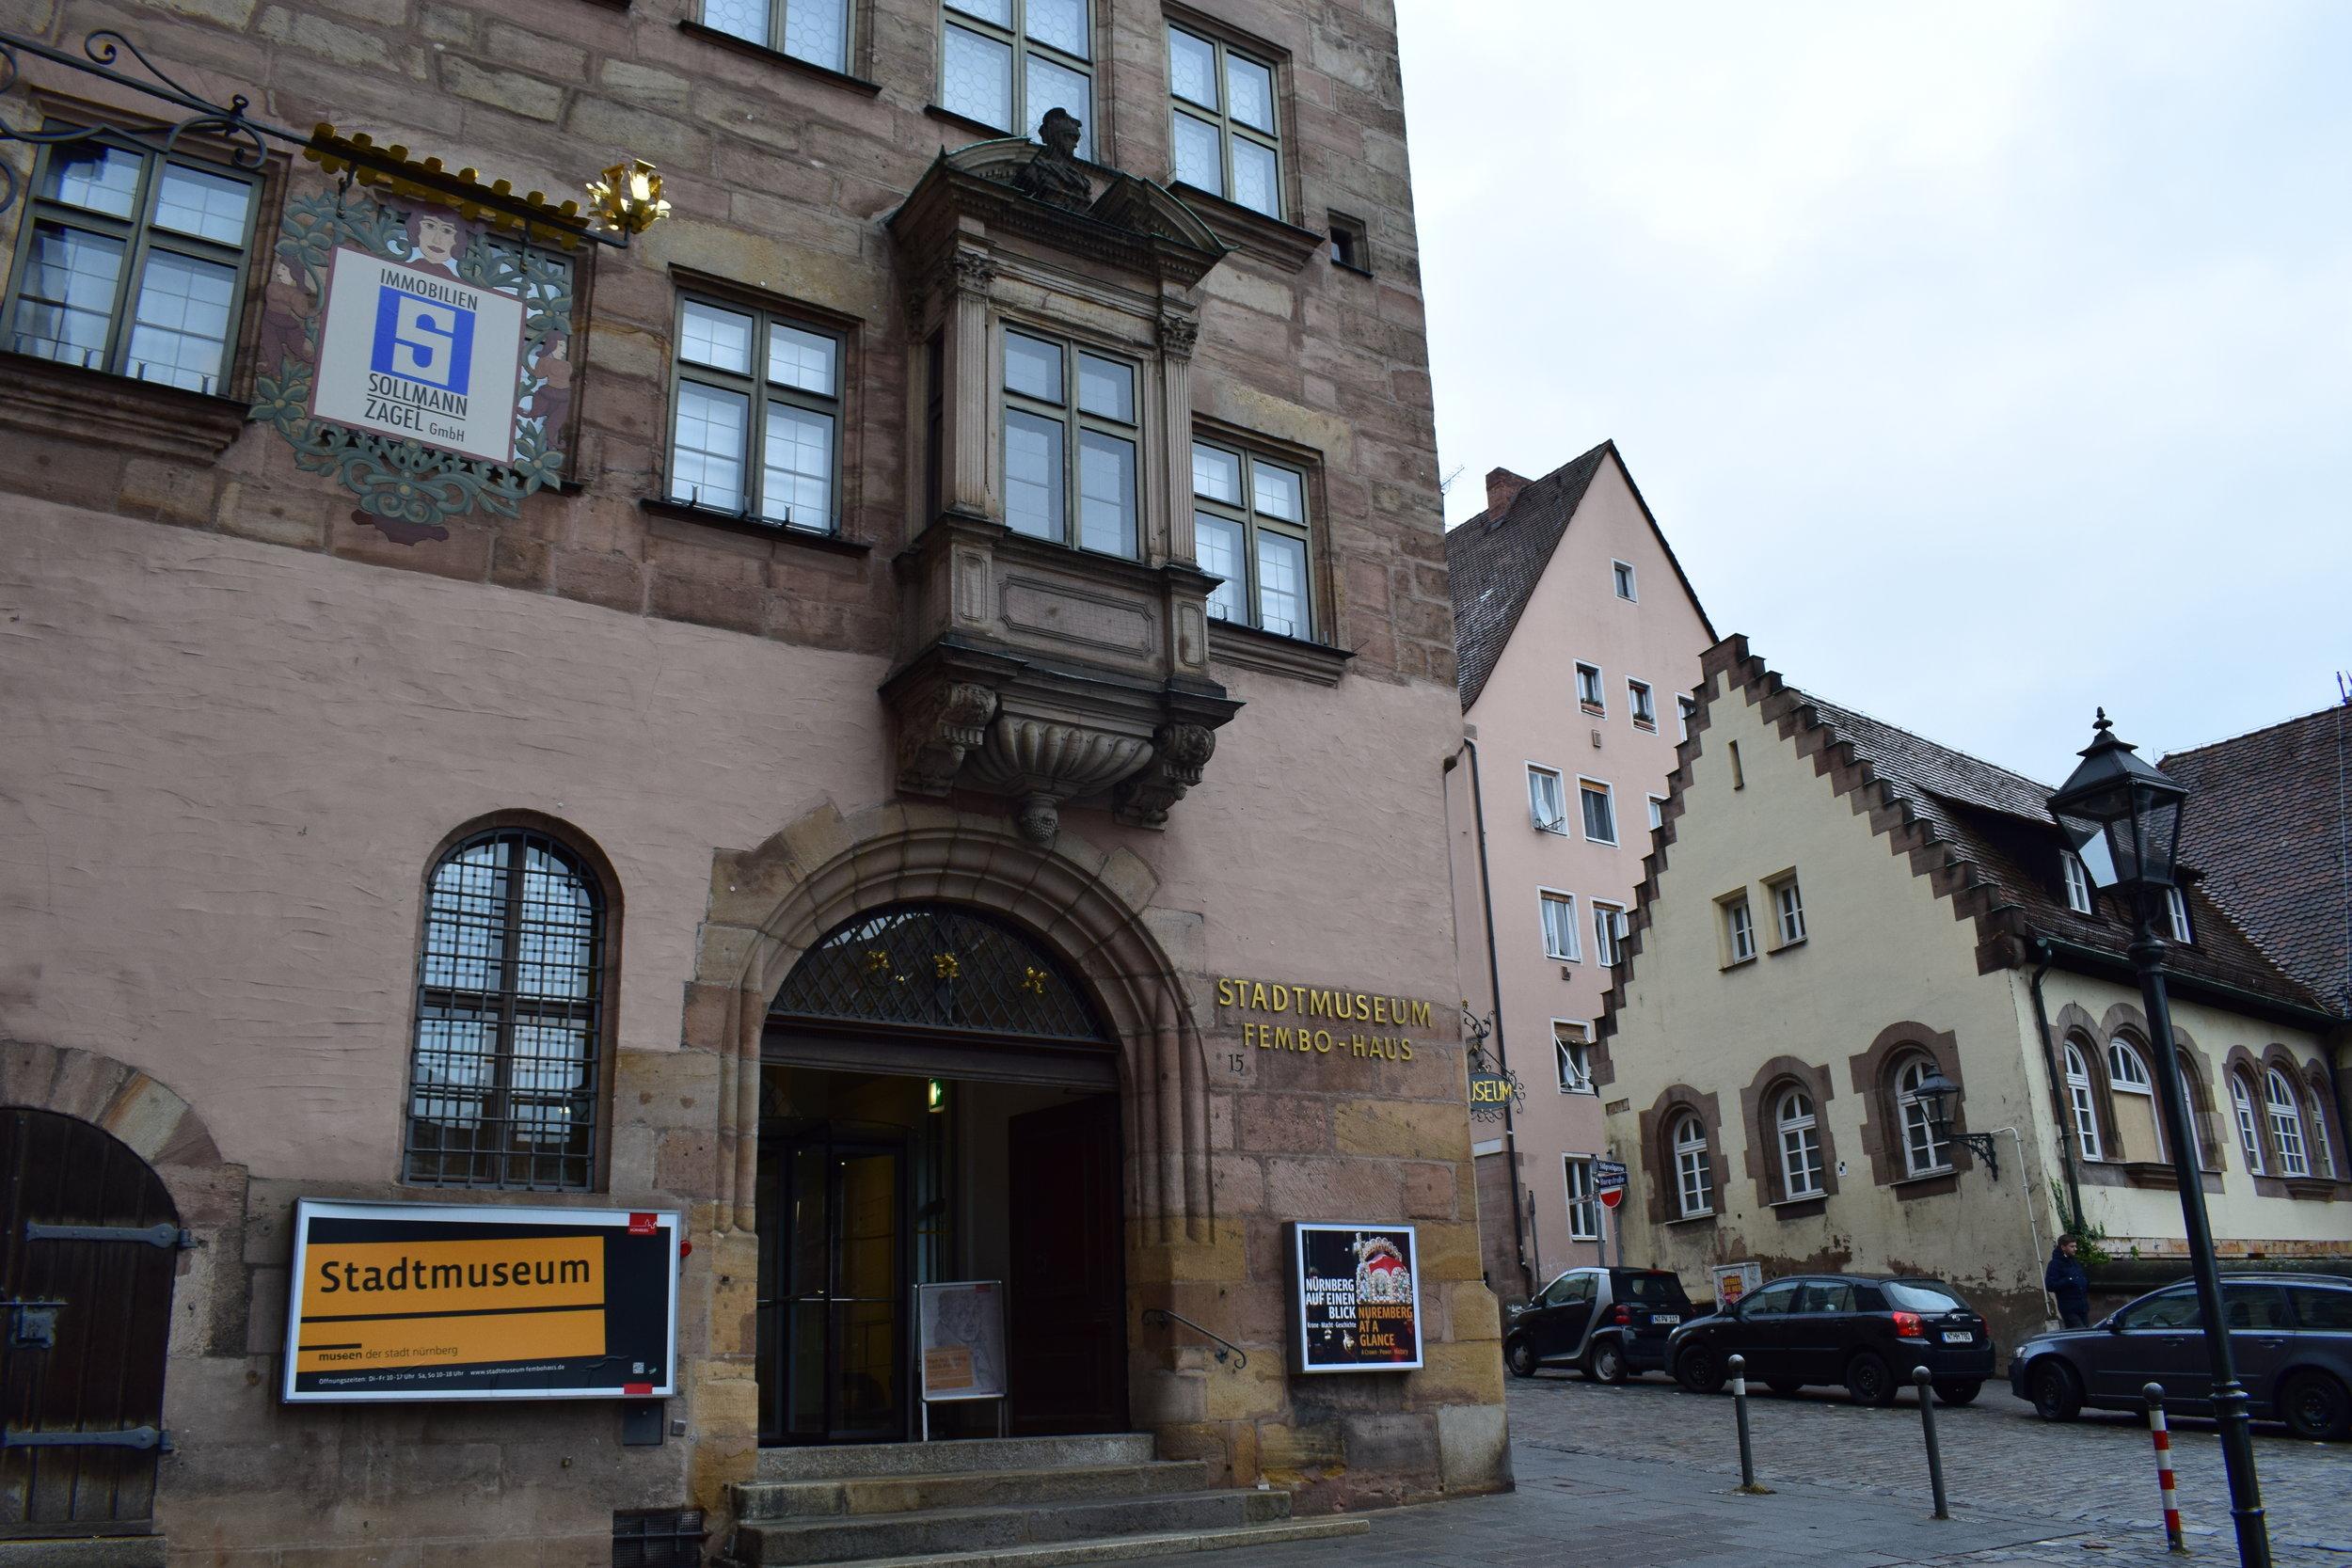 Stadtmuseum-Fembo-Haus-Nuremberg